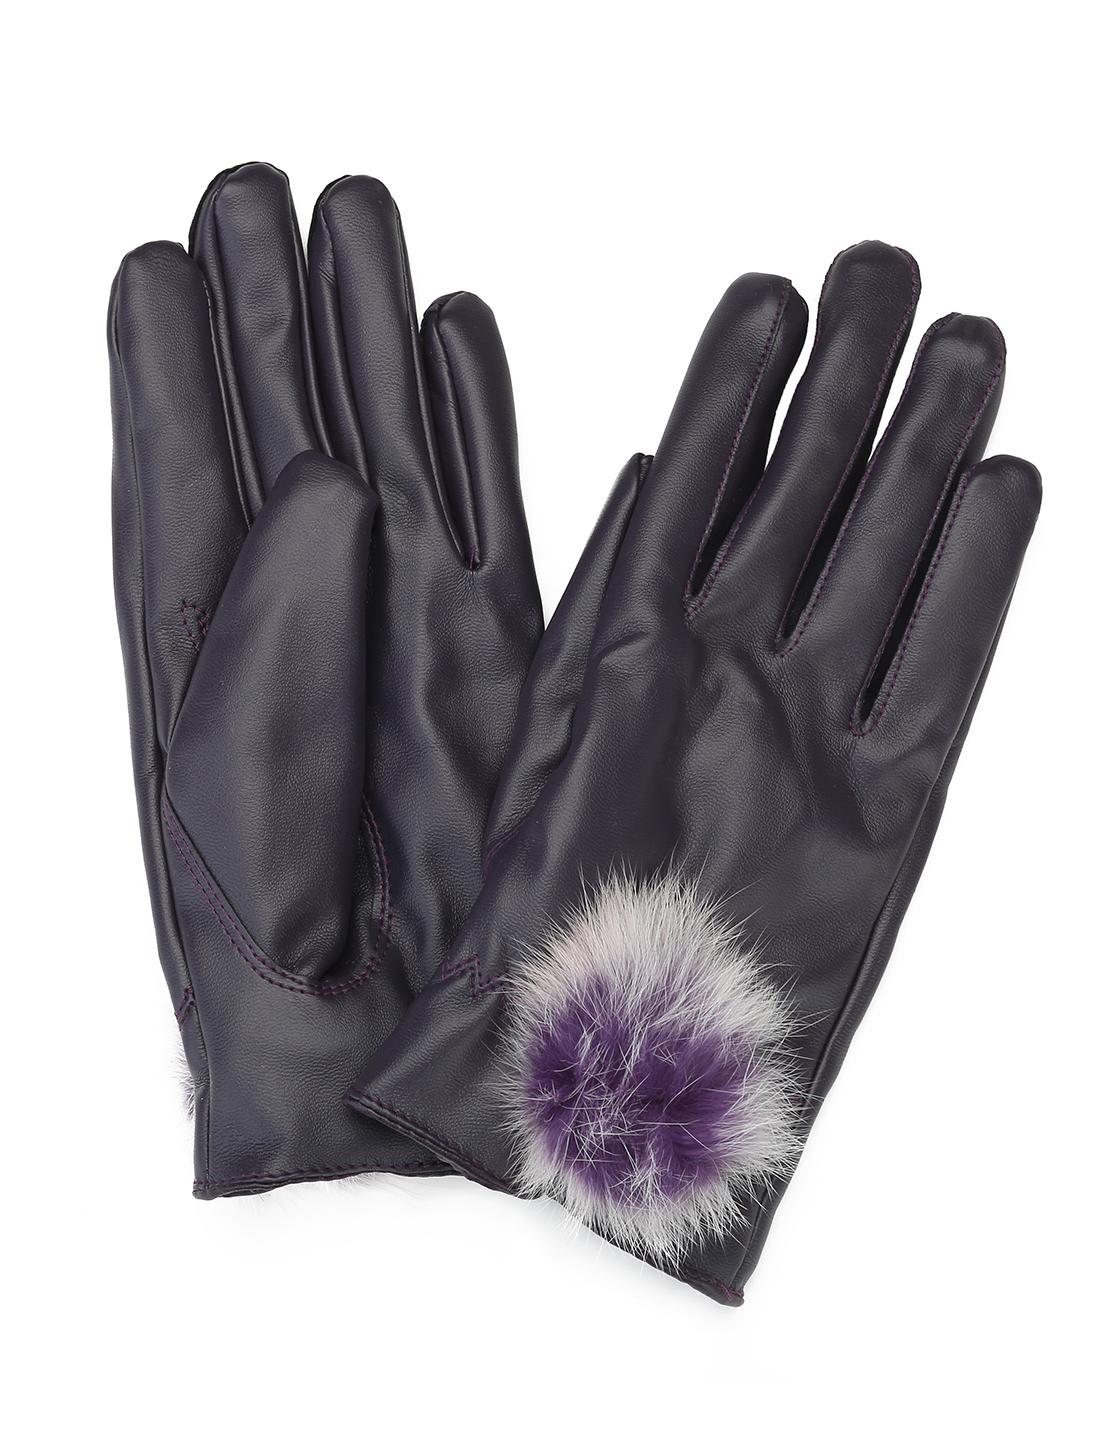 Women Pom-Pom Balls Decor Soft Lining PU Winter Gloves Pair Purple